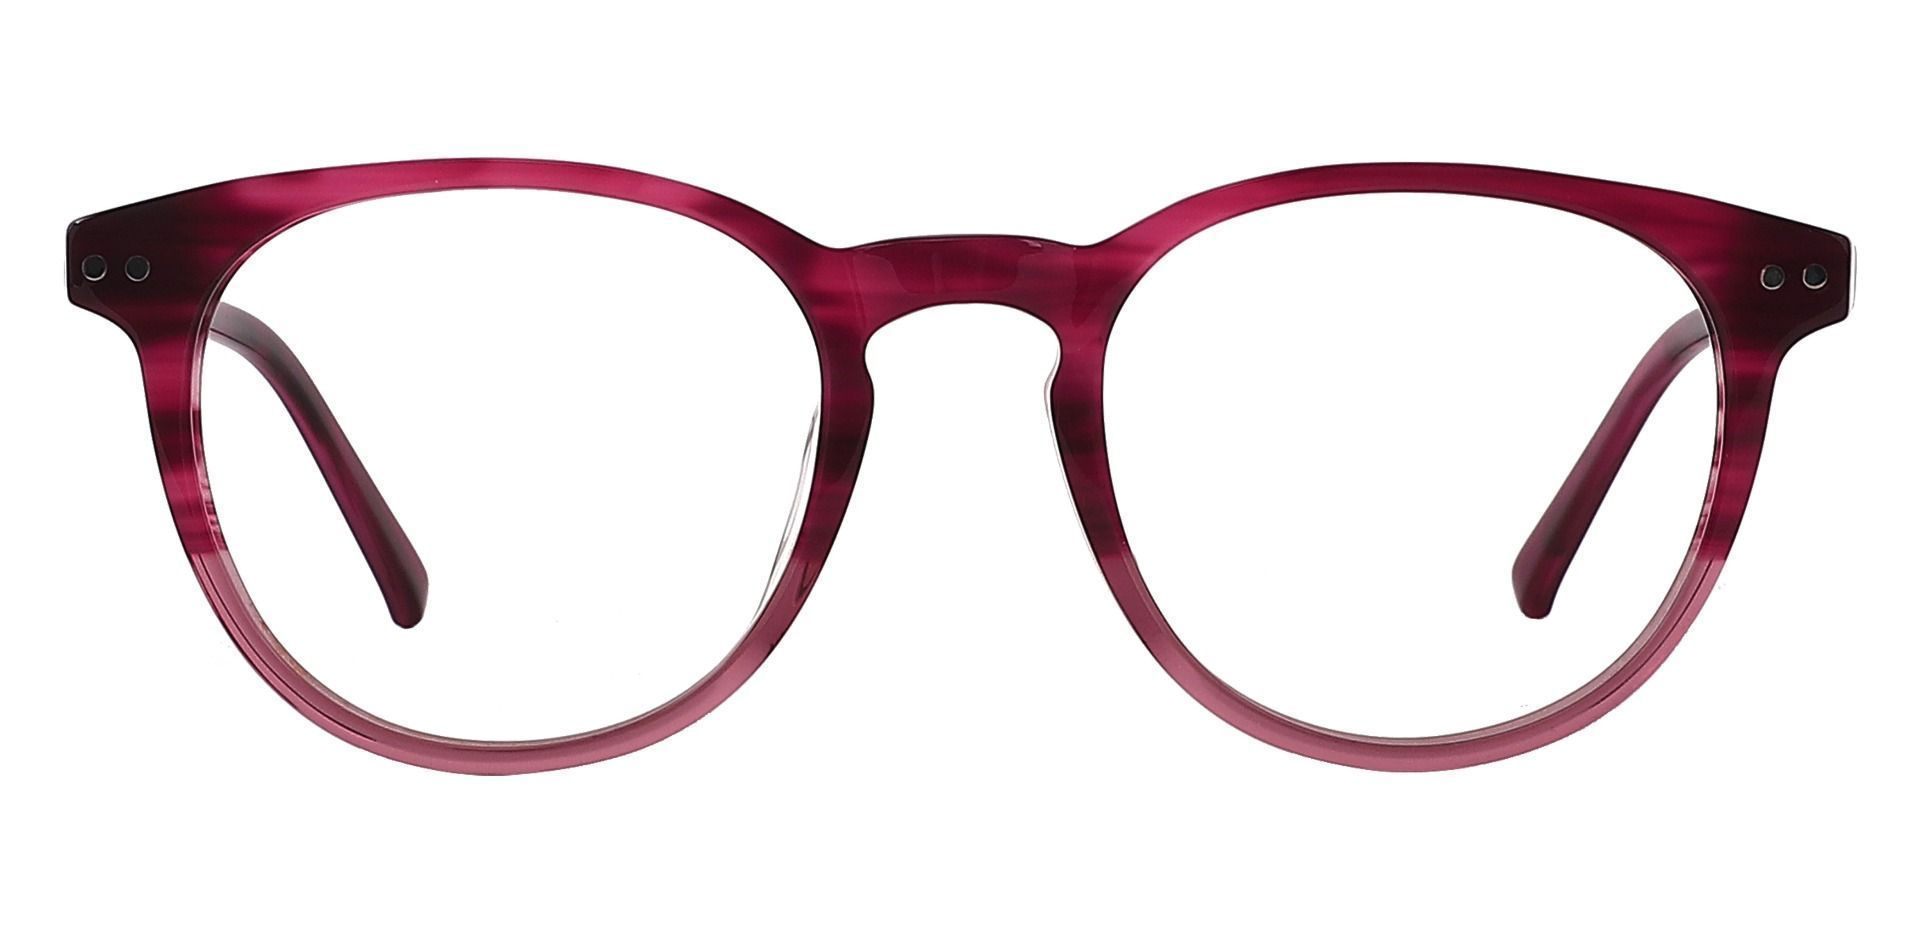 Marianna Oval Progressive Glasses - Red